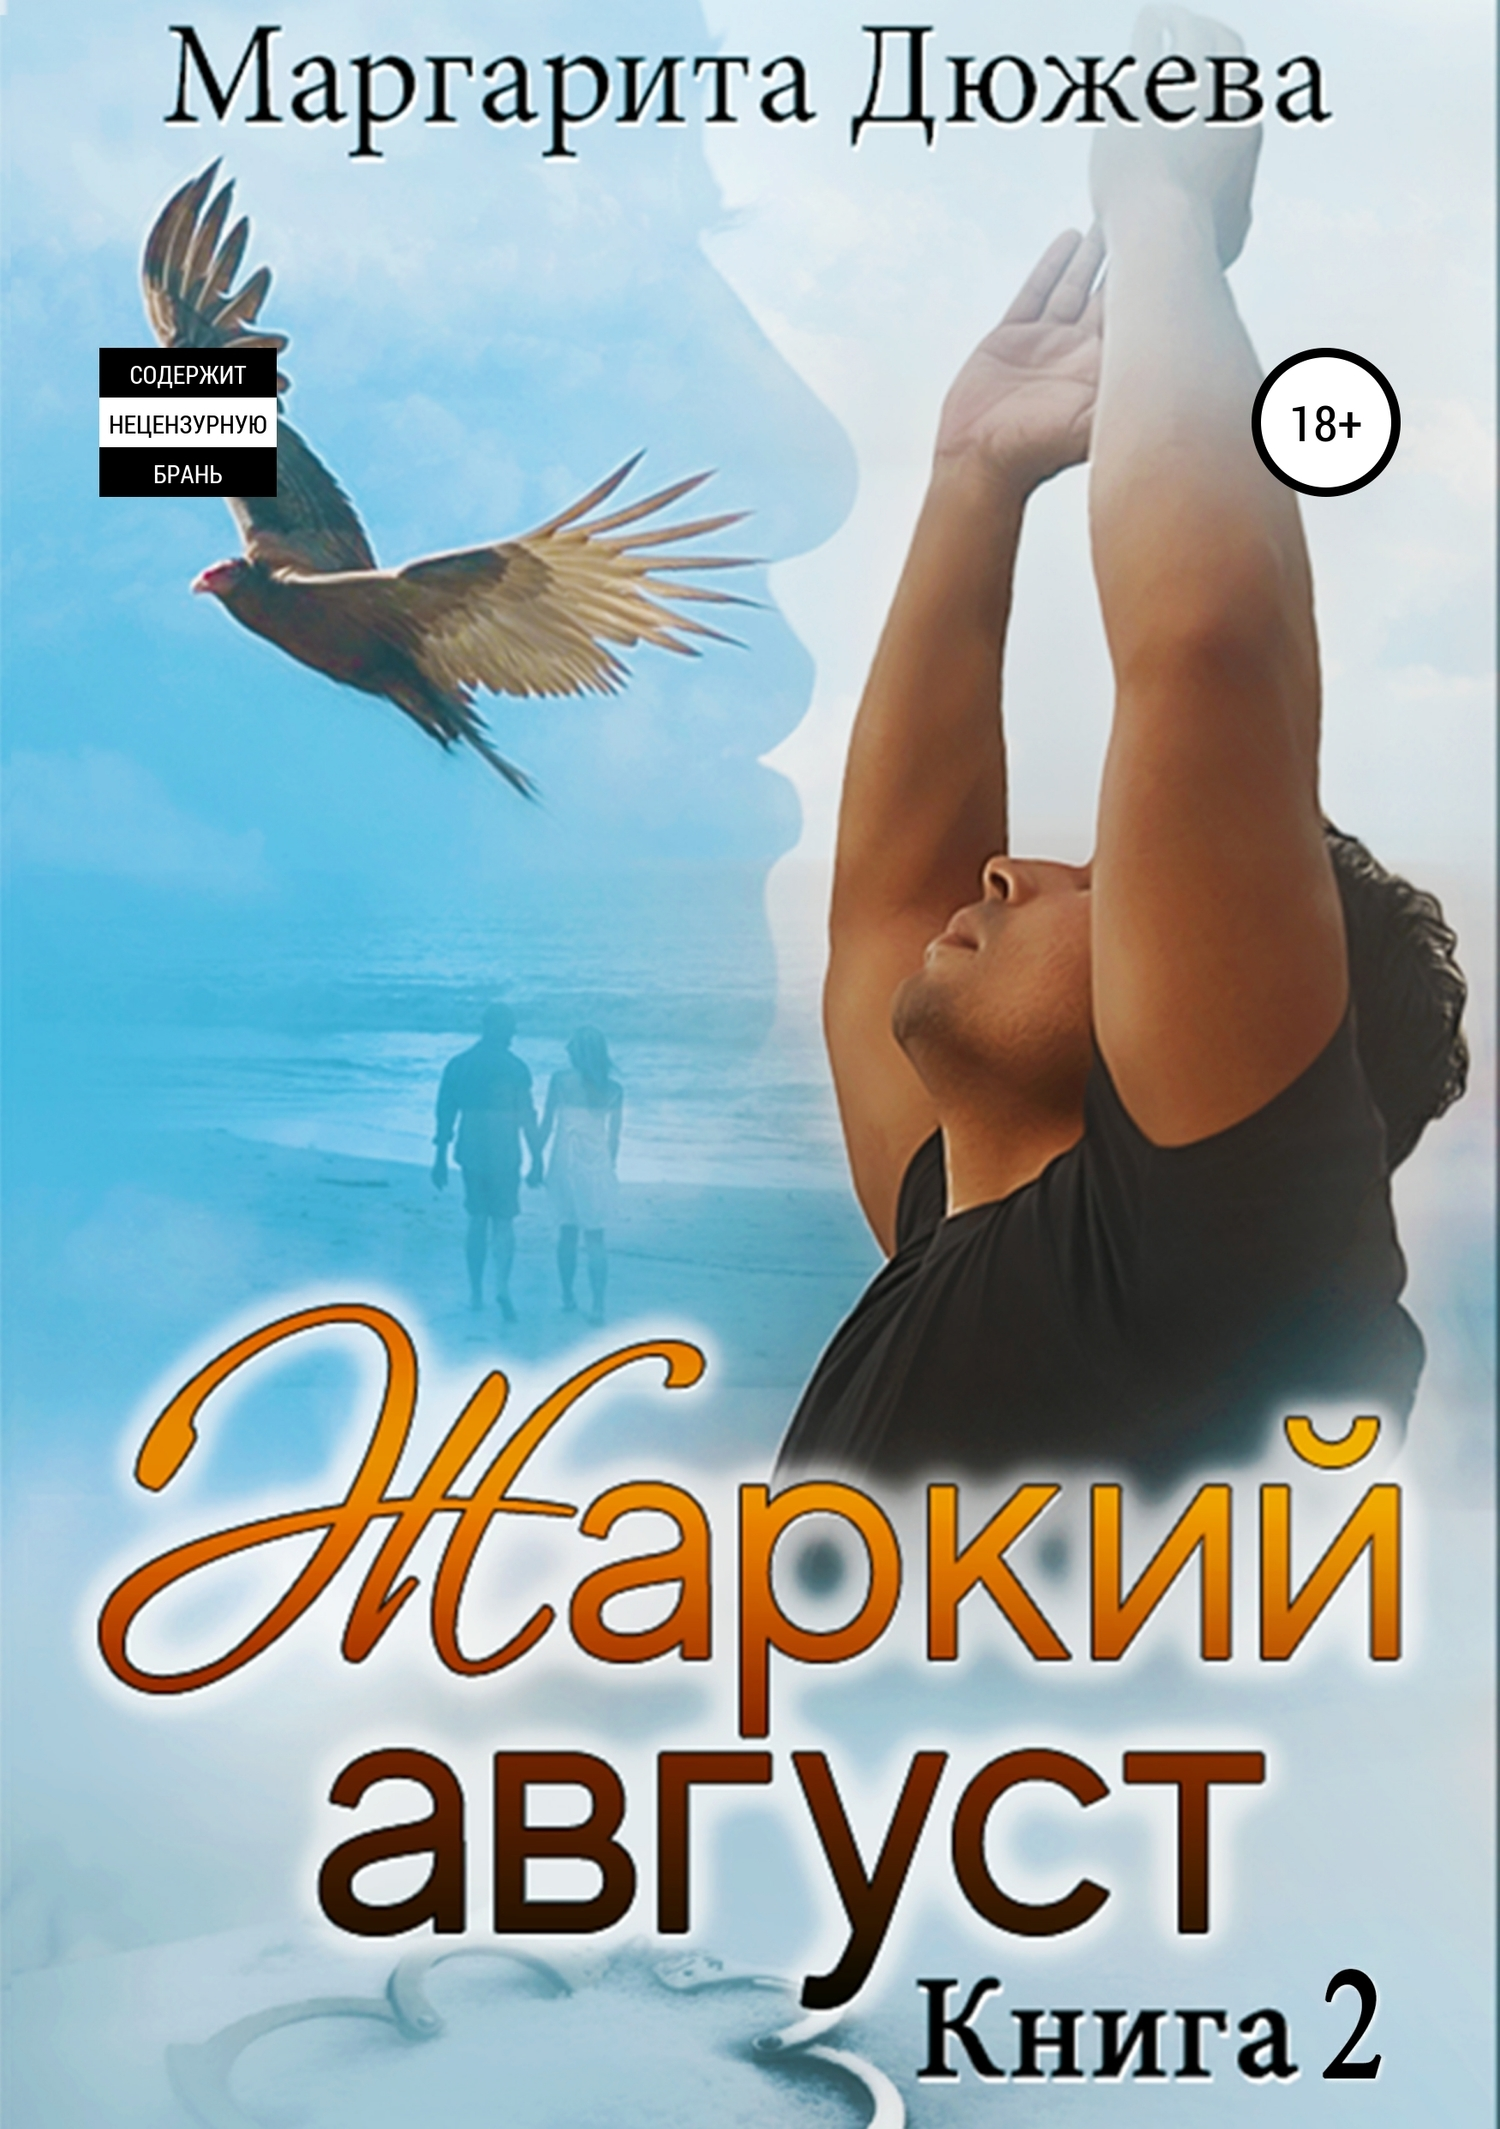 Маргарита Дюжева - Жаркий Август. Книга Вторая